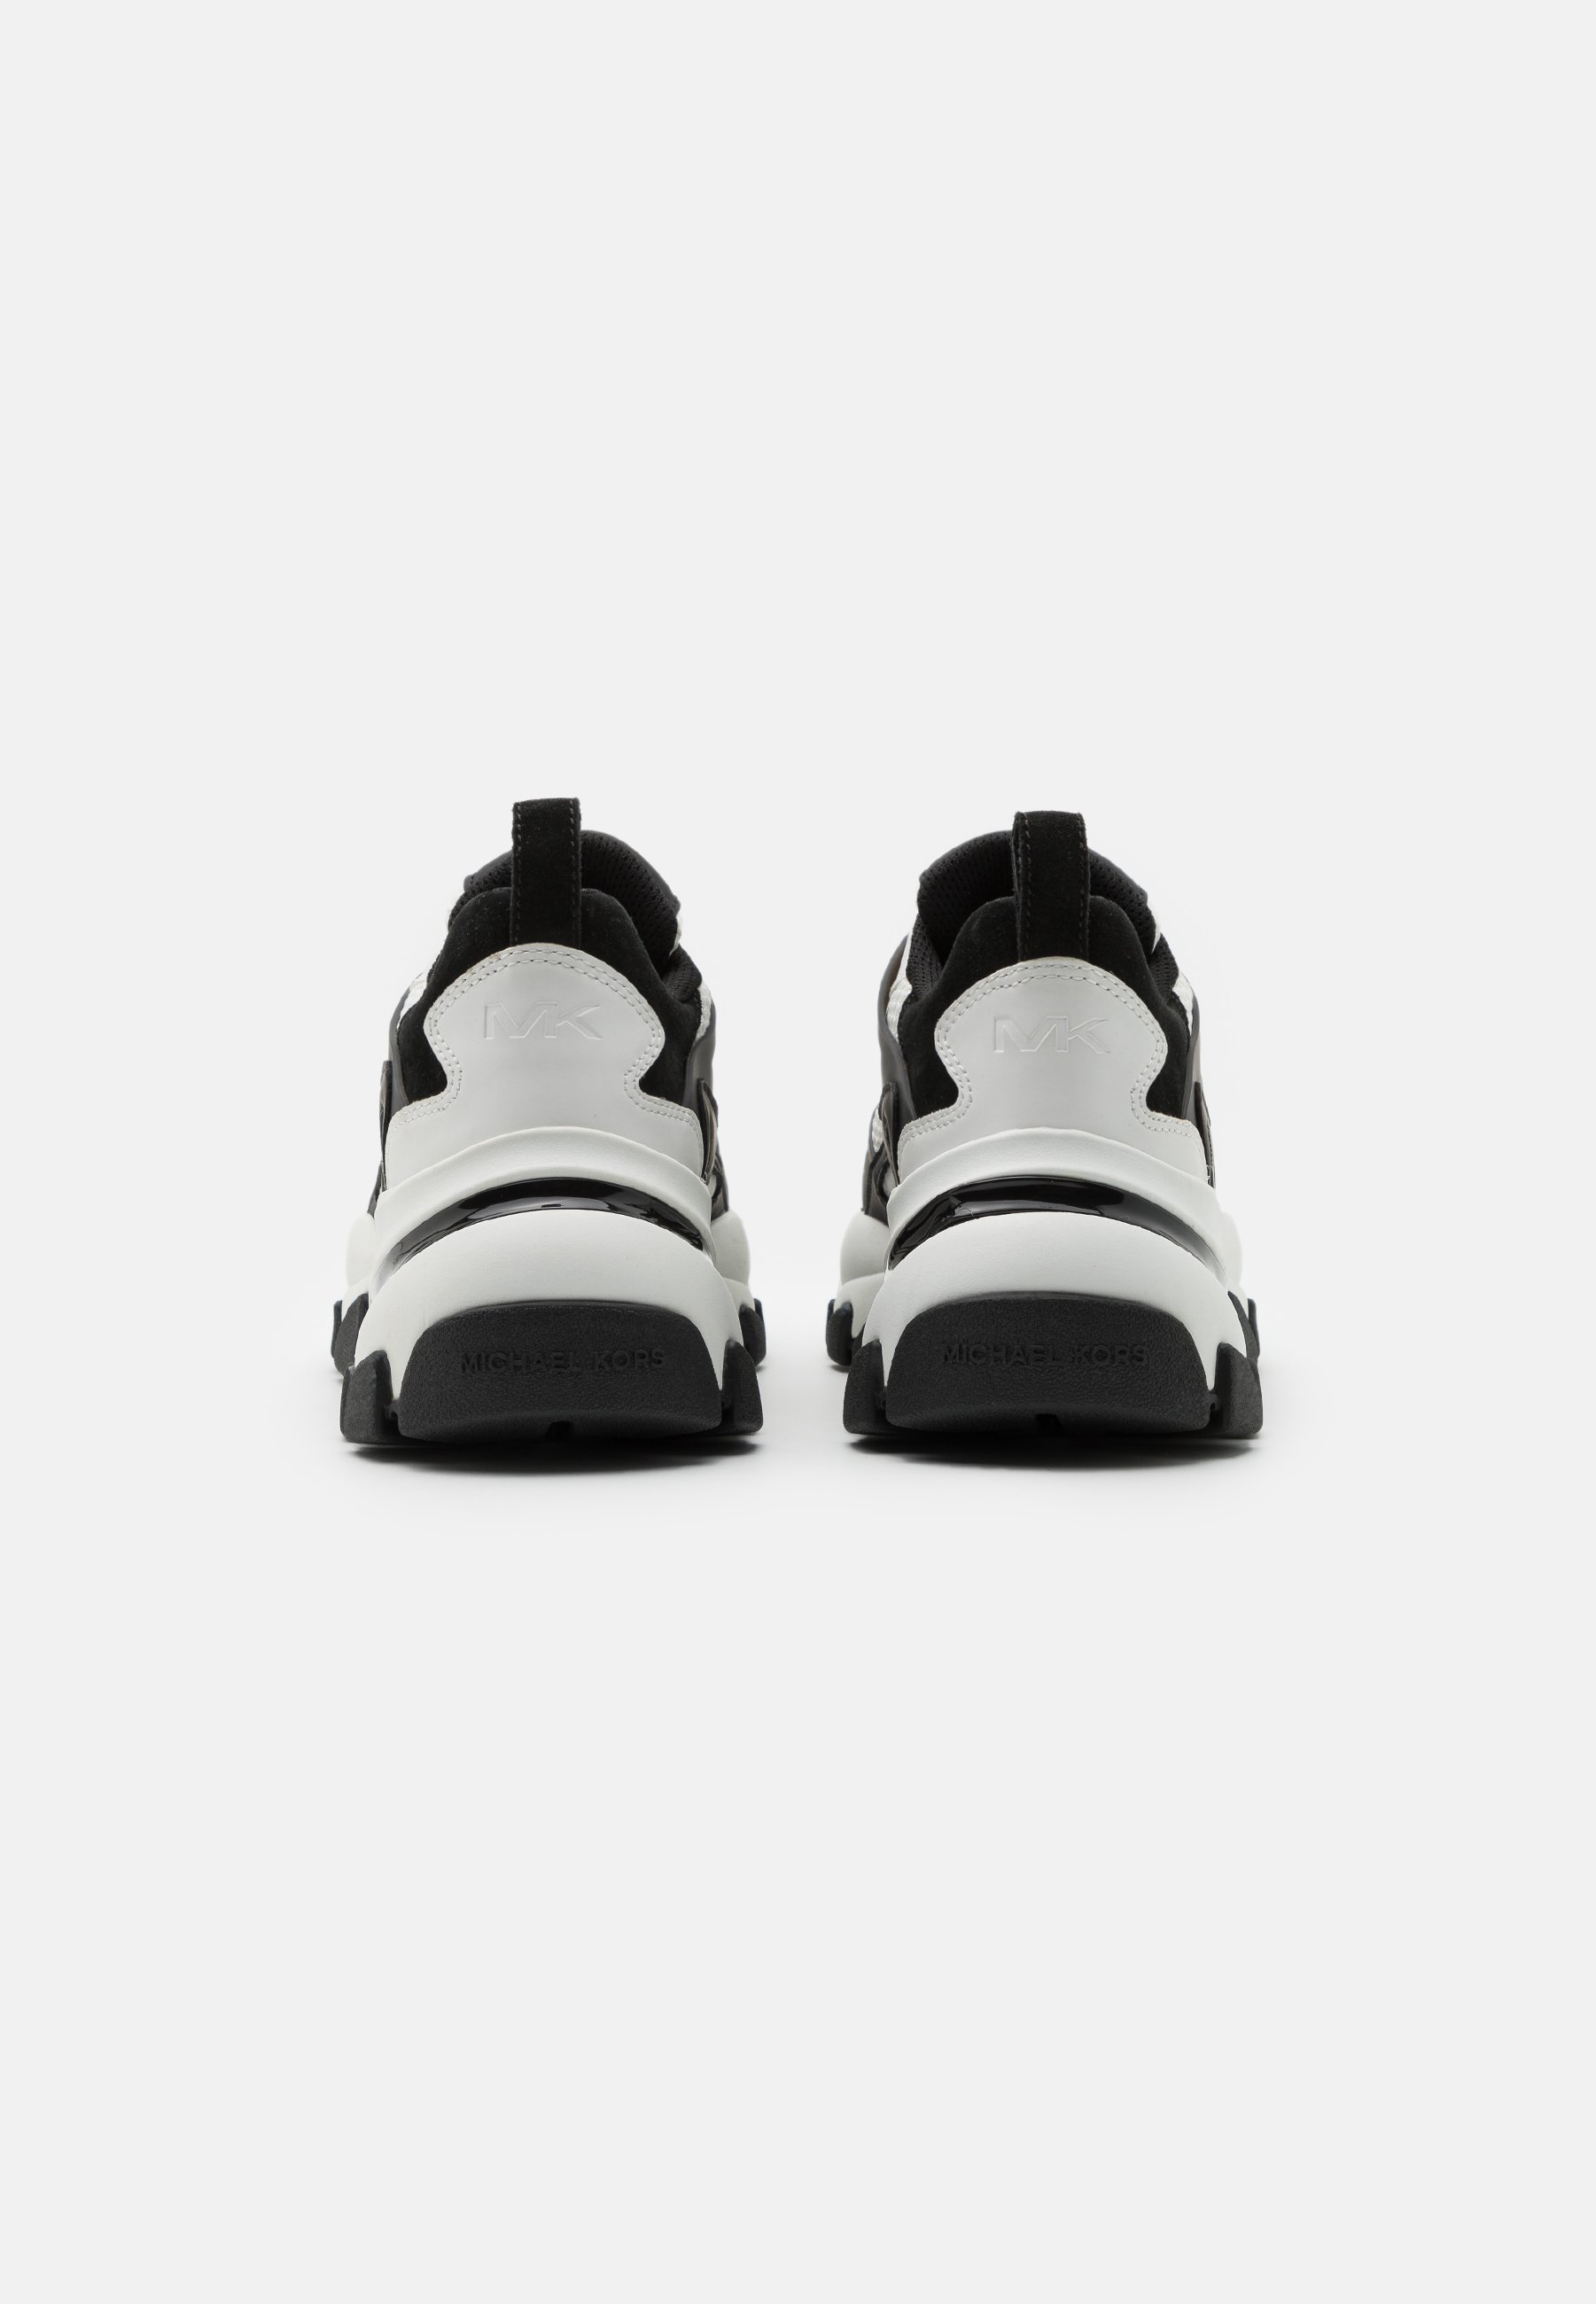 Michael Kors NICK TRAINER - Sneaker low - white/black/weiß - Herrenschuhe lToKz